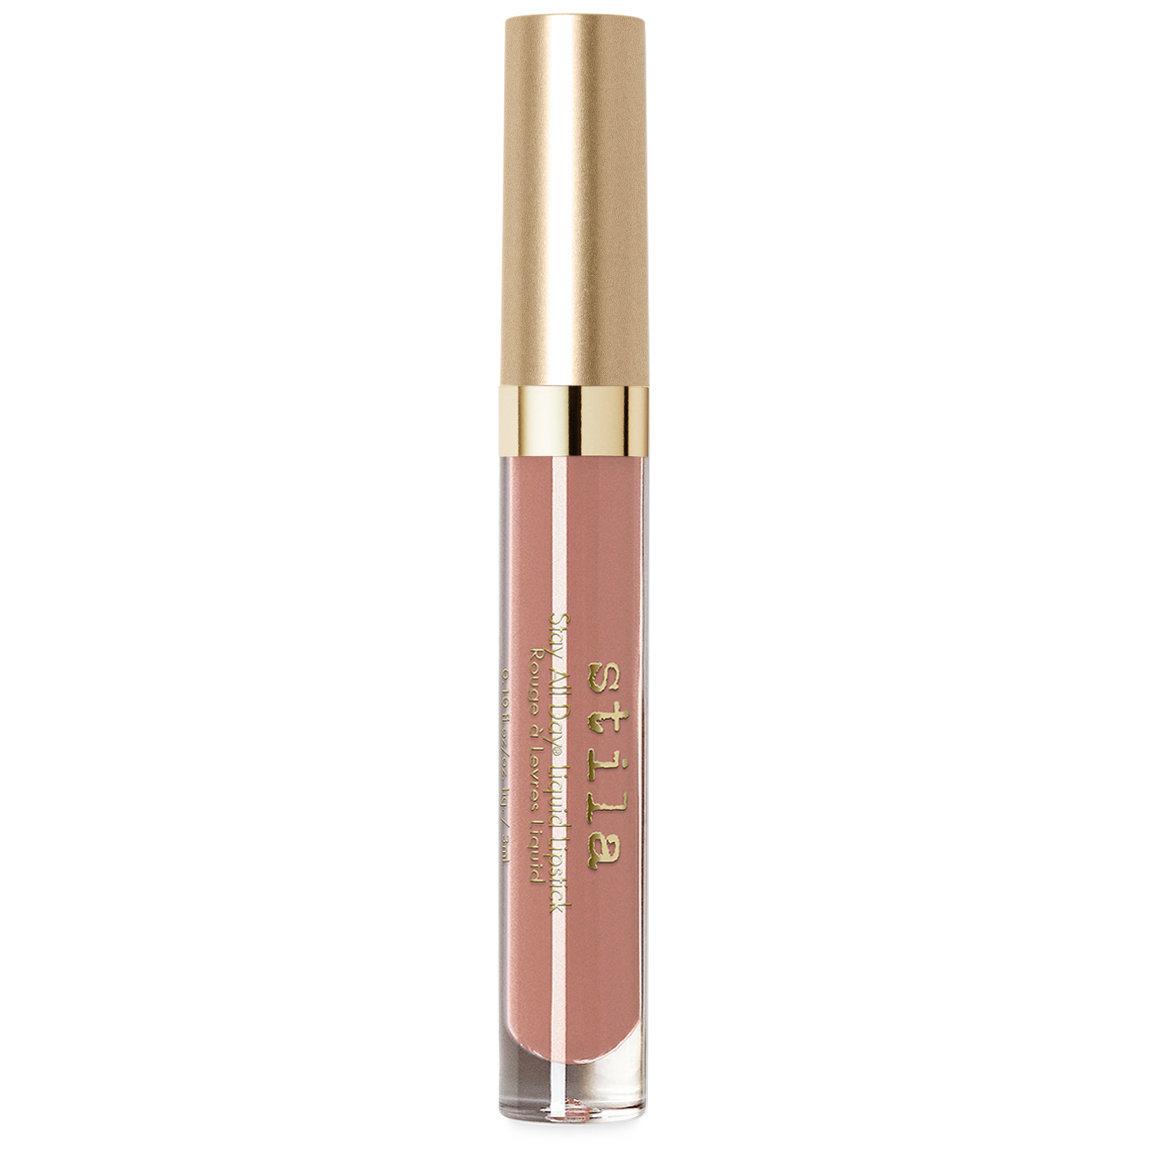 Stila Stay All Day Sheer Liquid Lipstick Sheer Carmello alternative view 1.